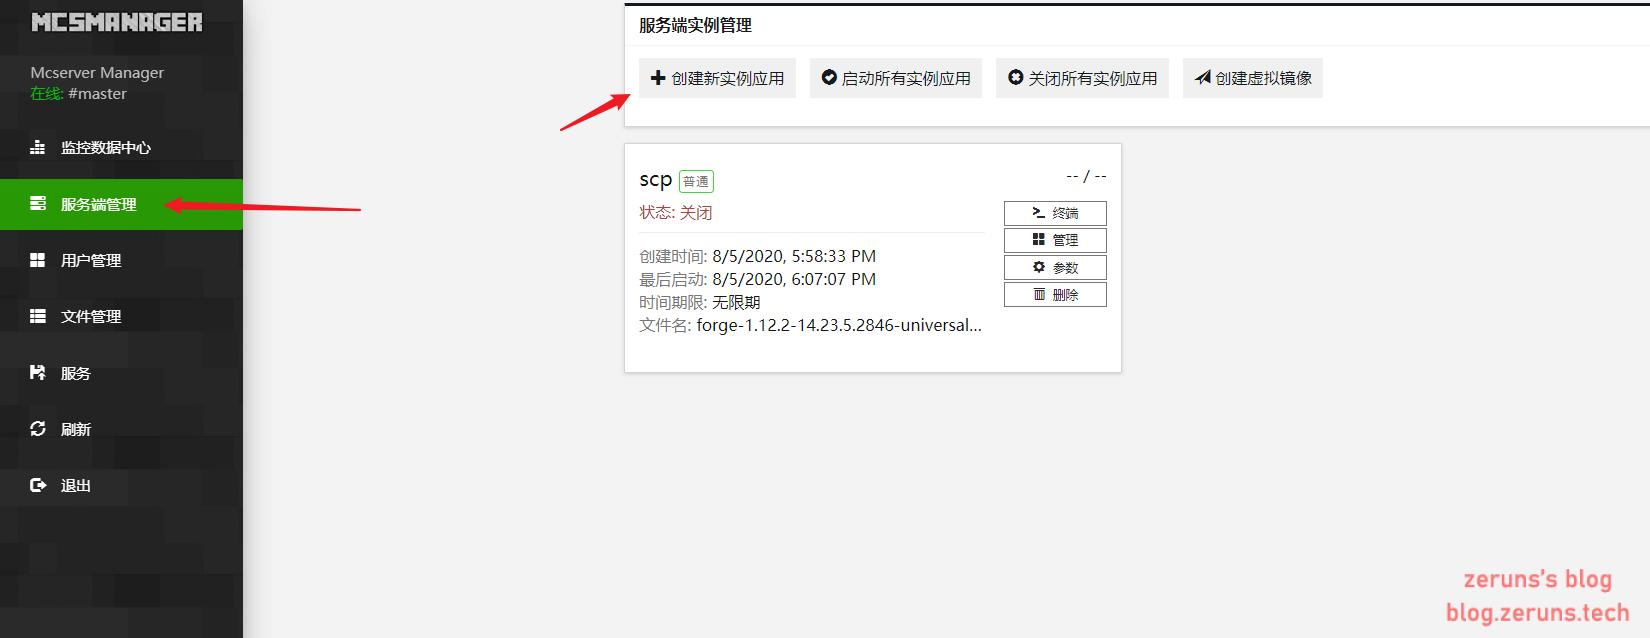 2020 08 06 02 22 47 - Linux搭建MC私服forge版,带WEB管理面板